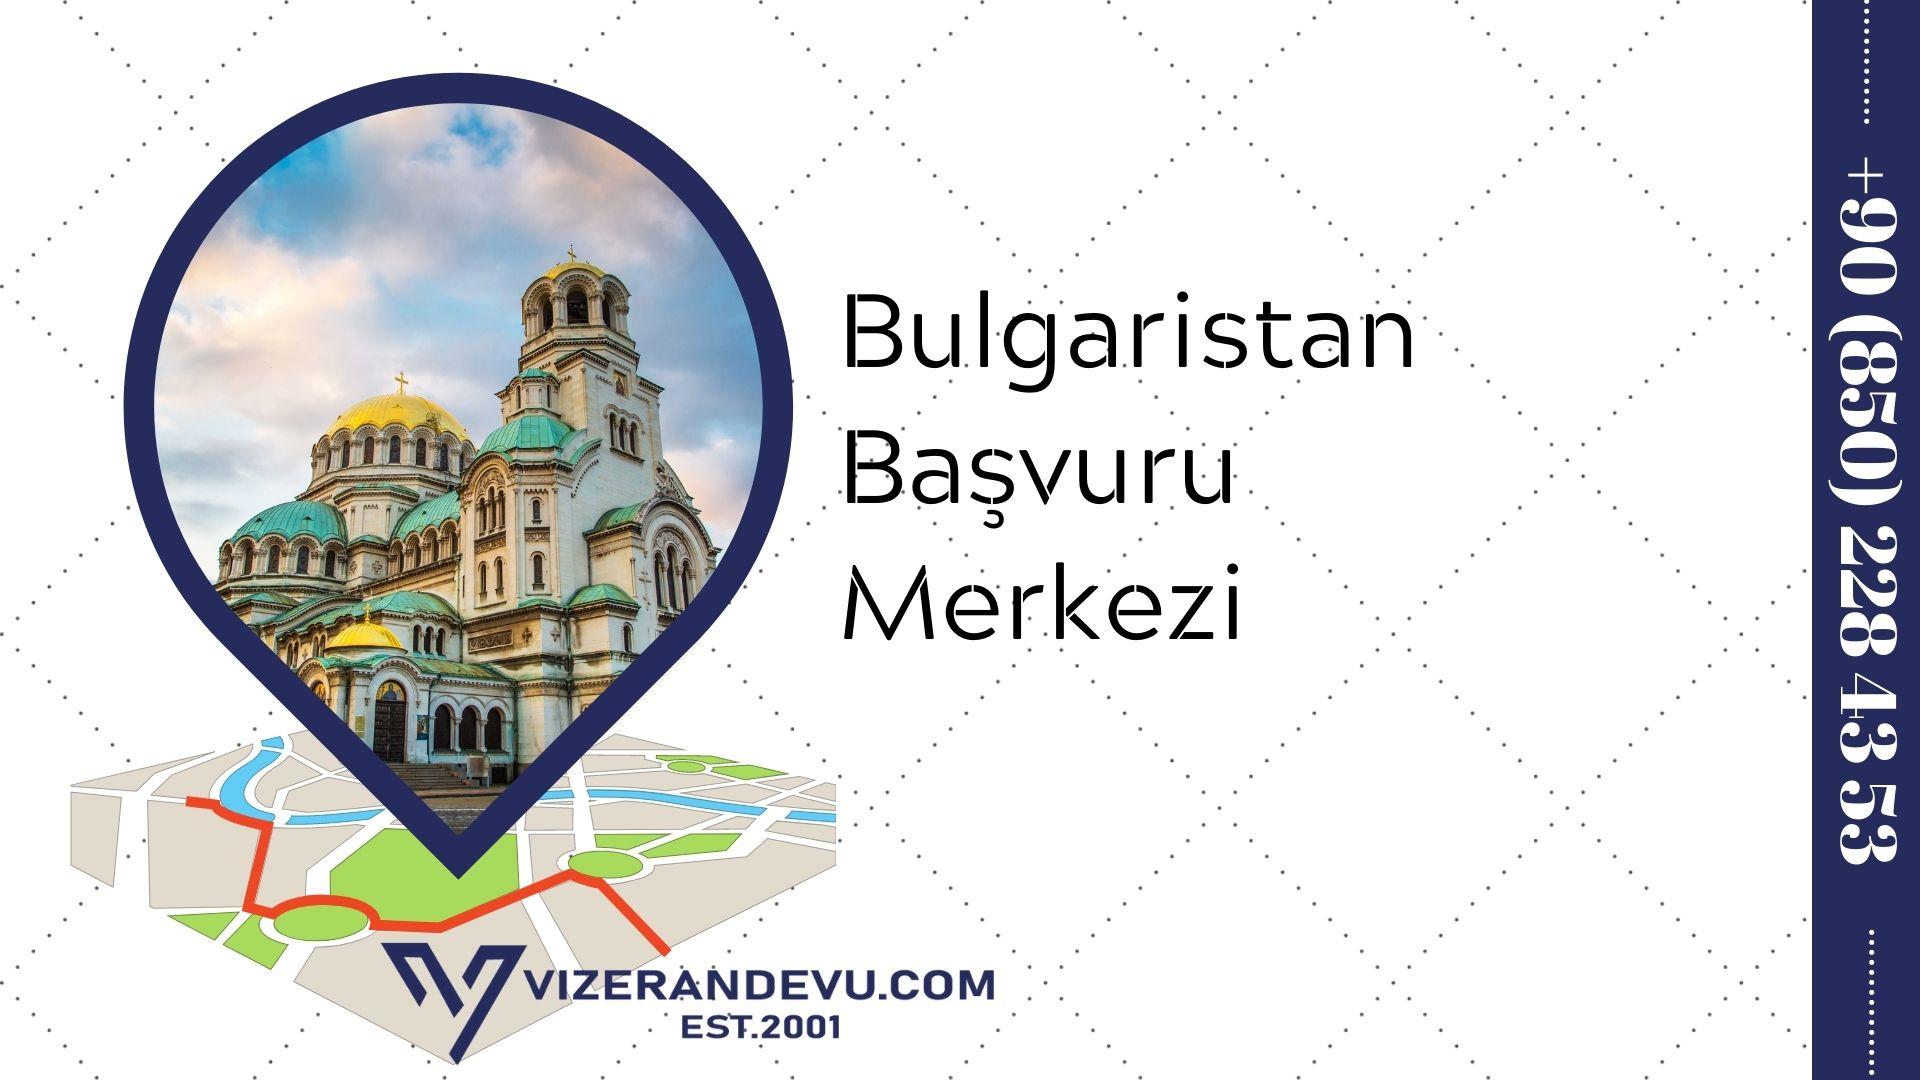 Bulgaristan Başvuru Merkezi